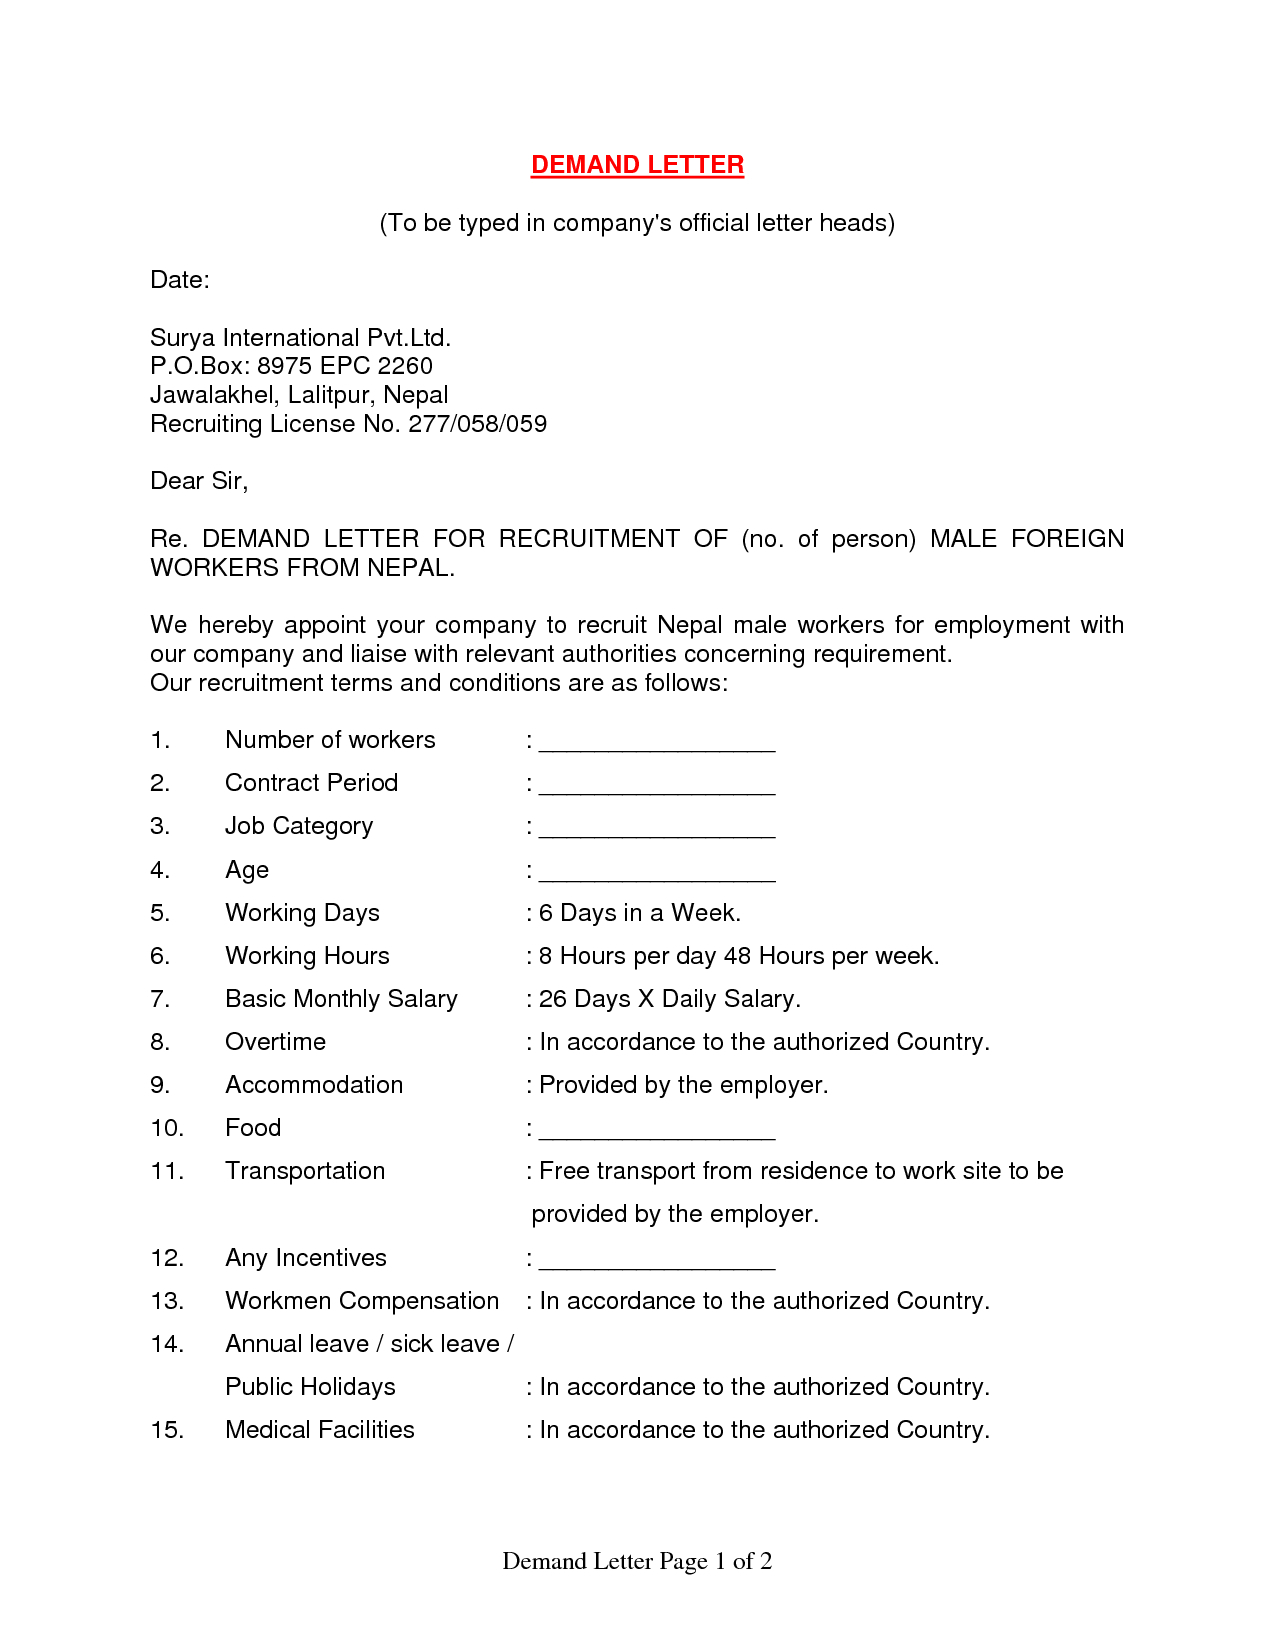 auto accident demand letter template Collection-auto accident demand letter template how to write a letter of demand car accident image collections how to write a letter 5n 11-g